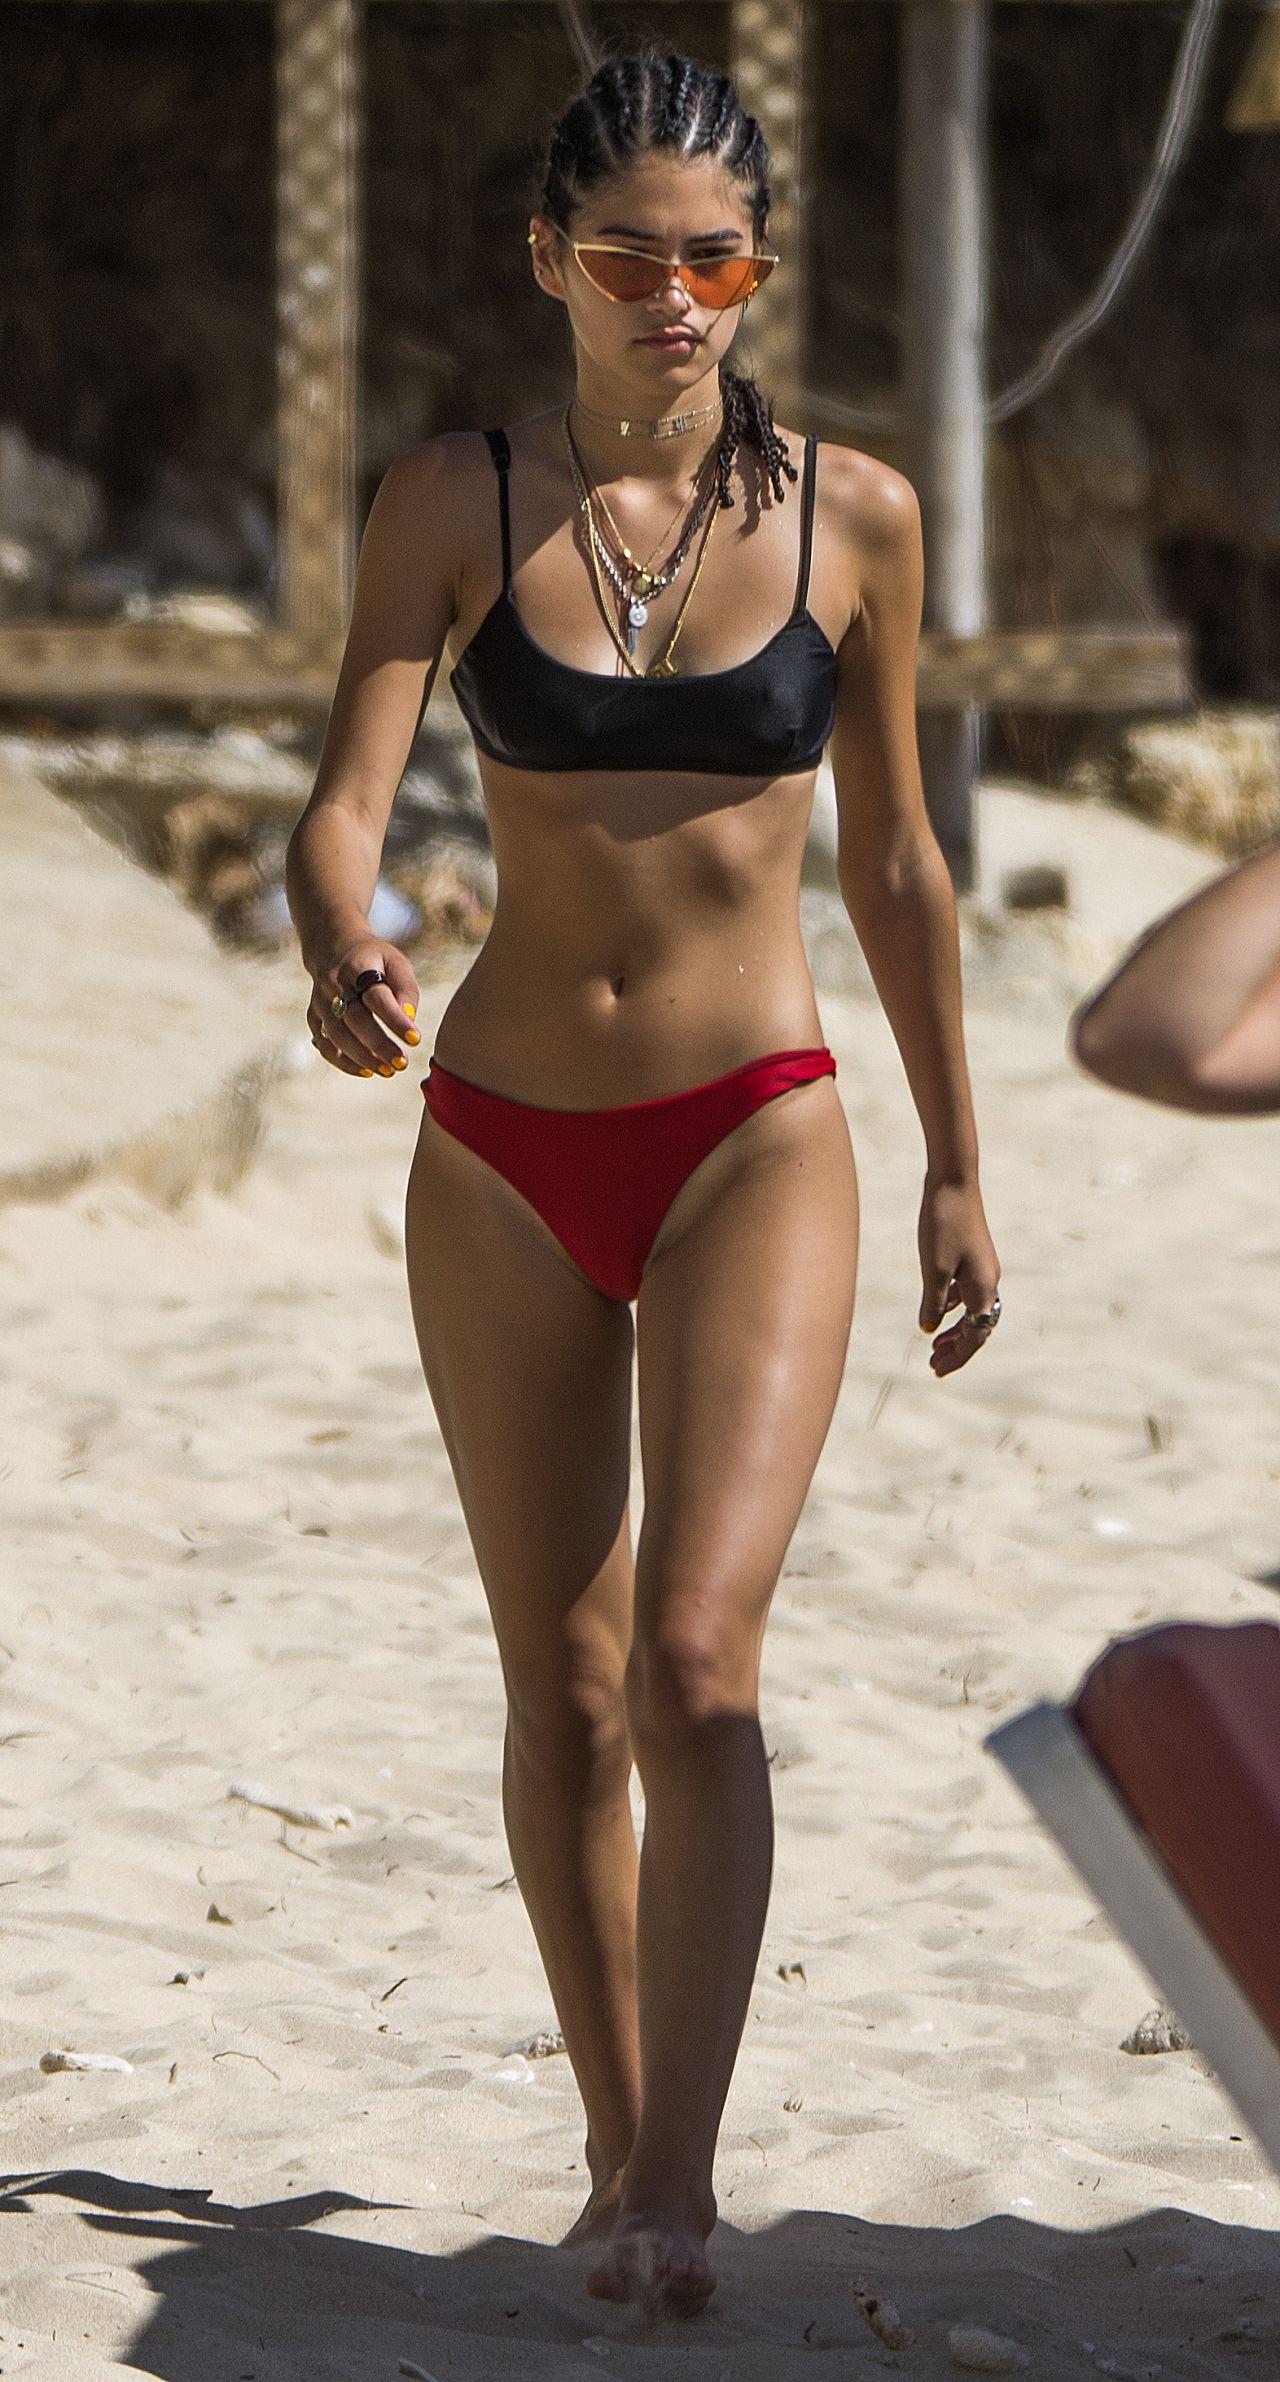 2019 Kim Turnbull nude photos 2019